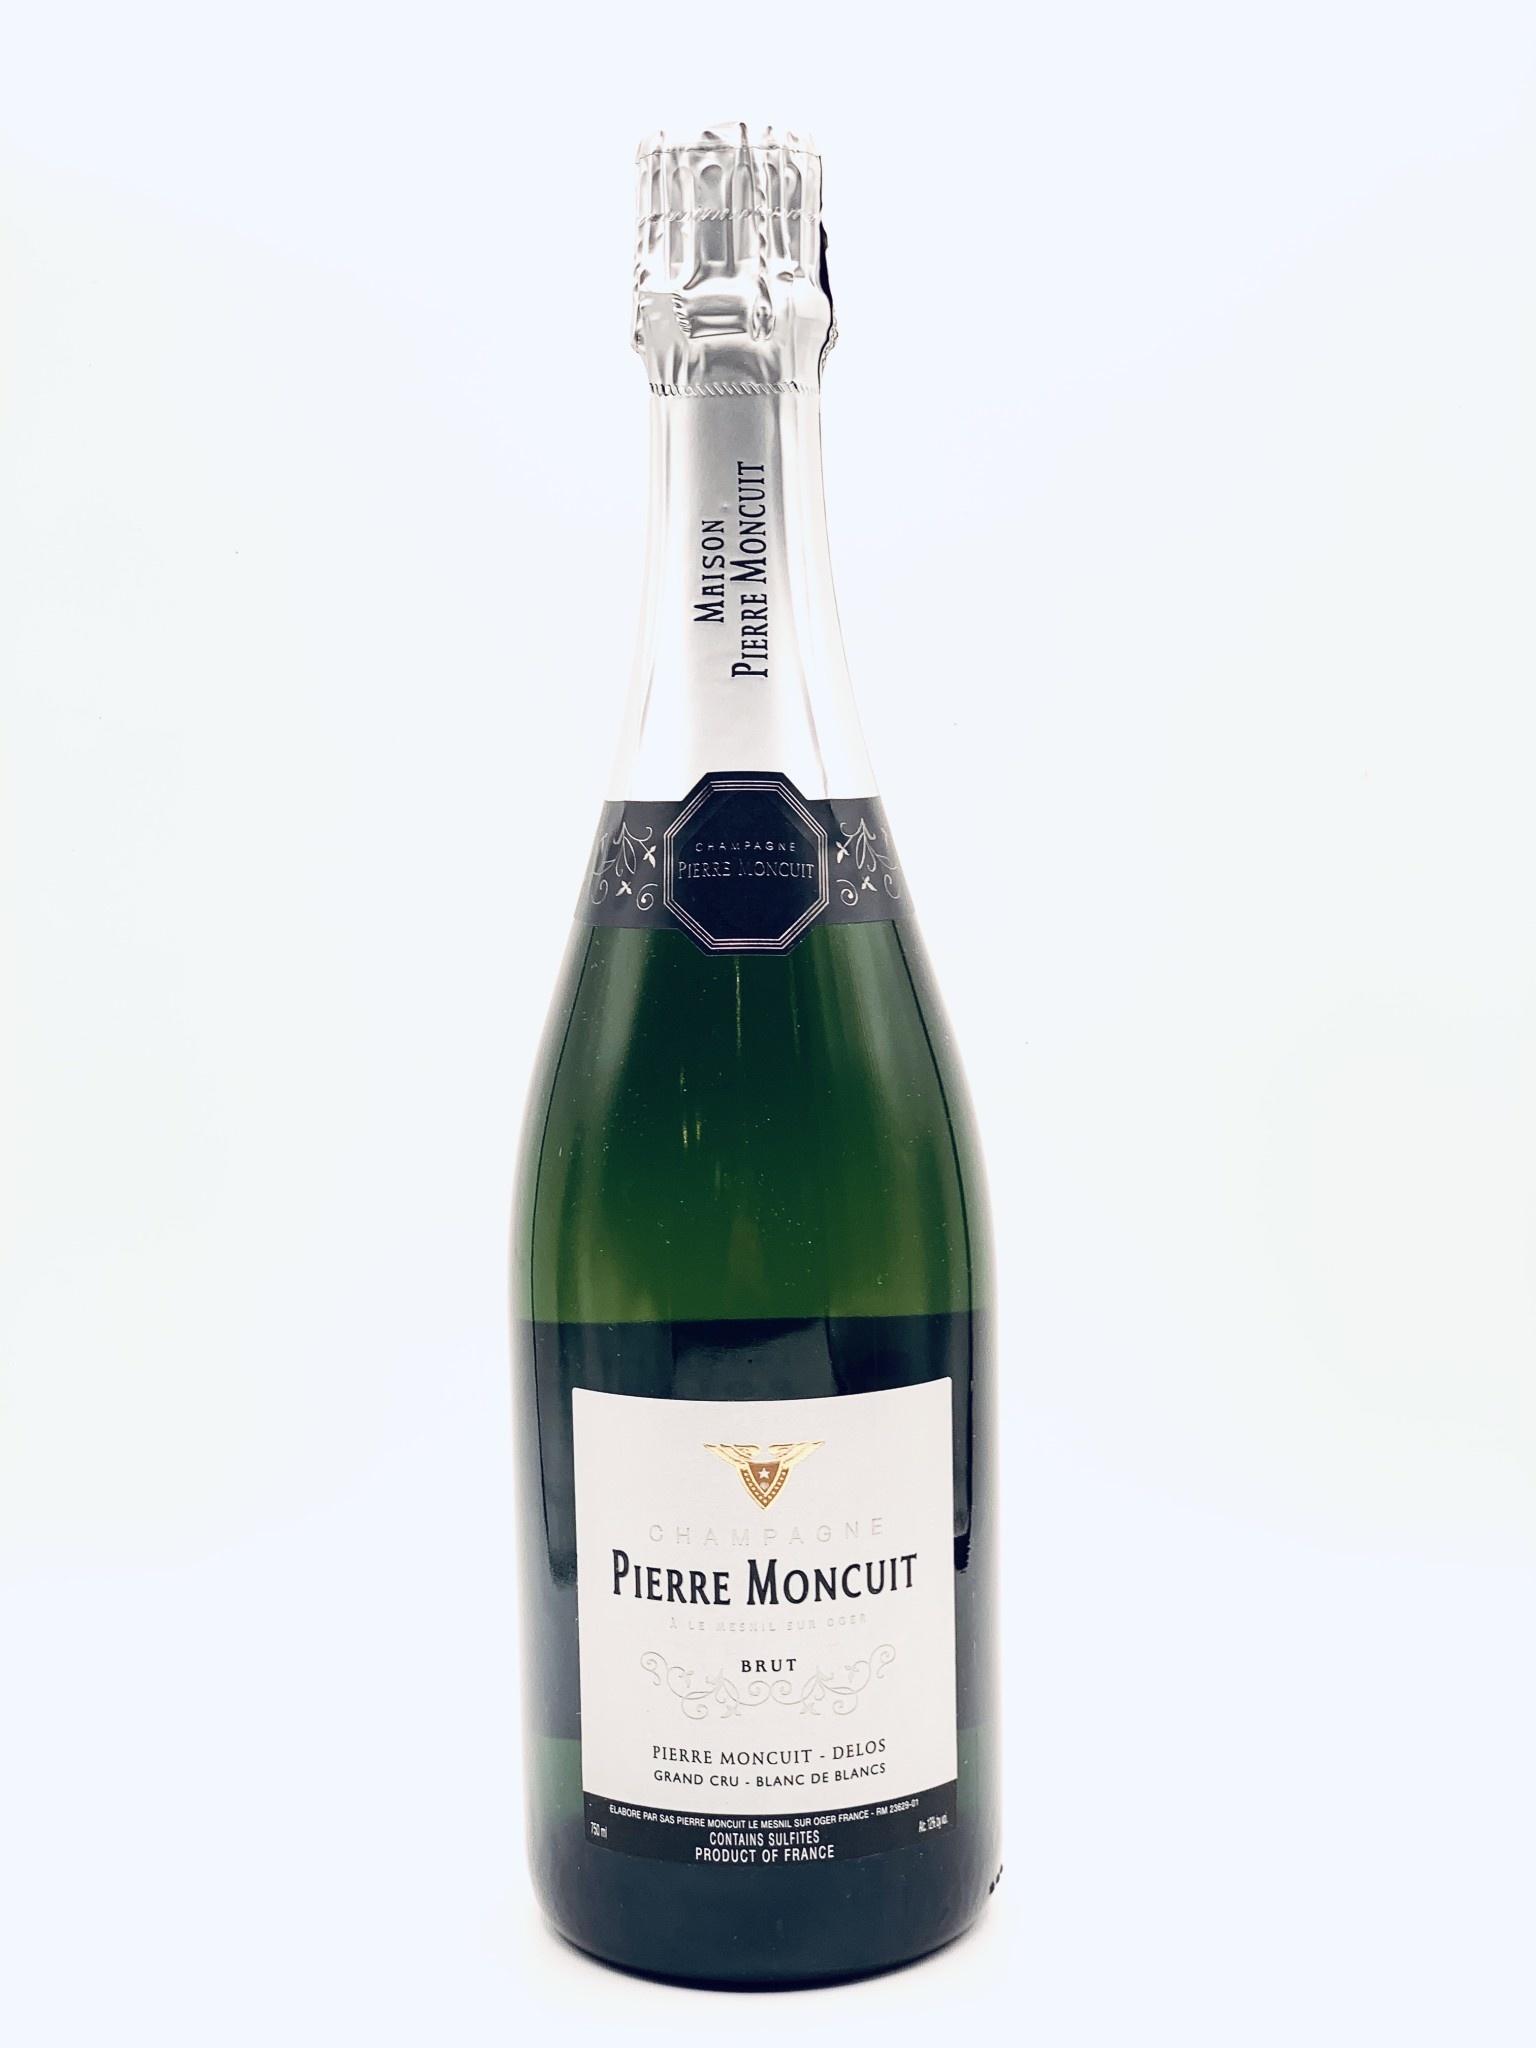 Champagne Brut Grand Cru Blanc de Blancs NV Pierre Moncuit-Delos